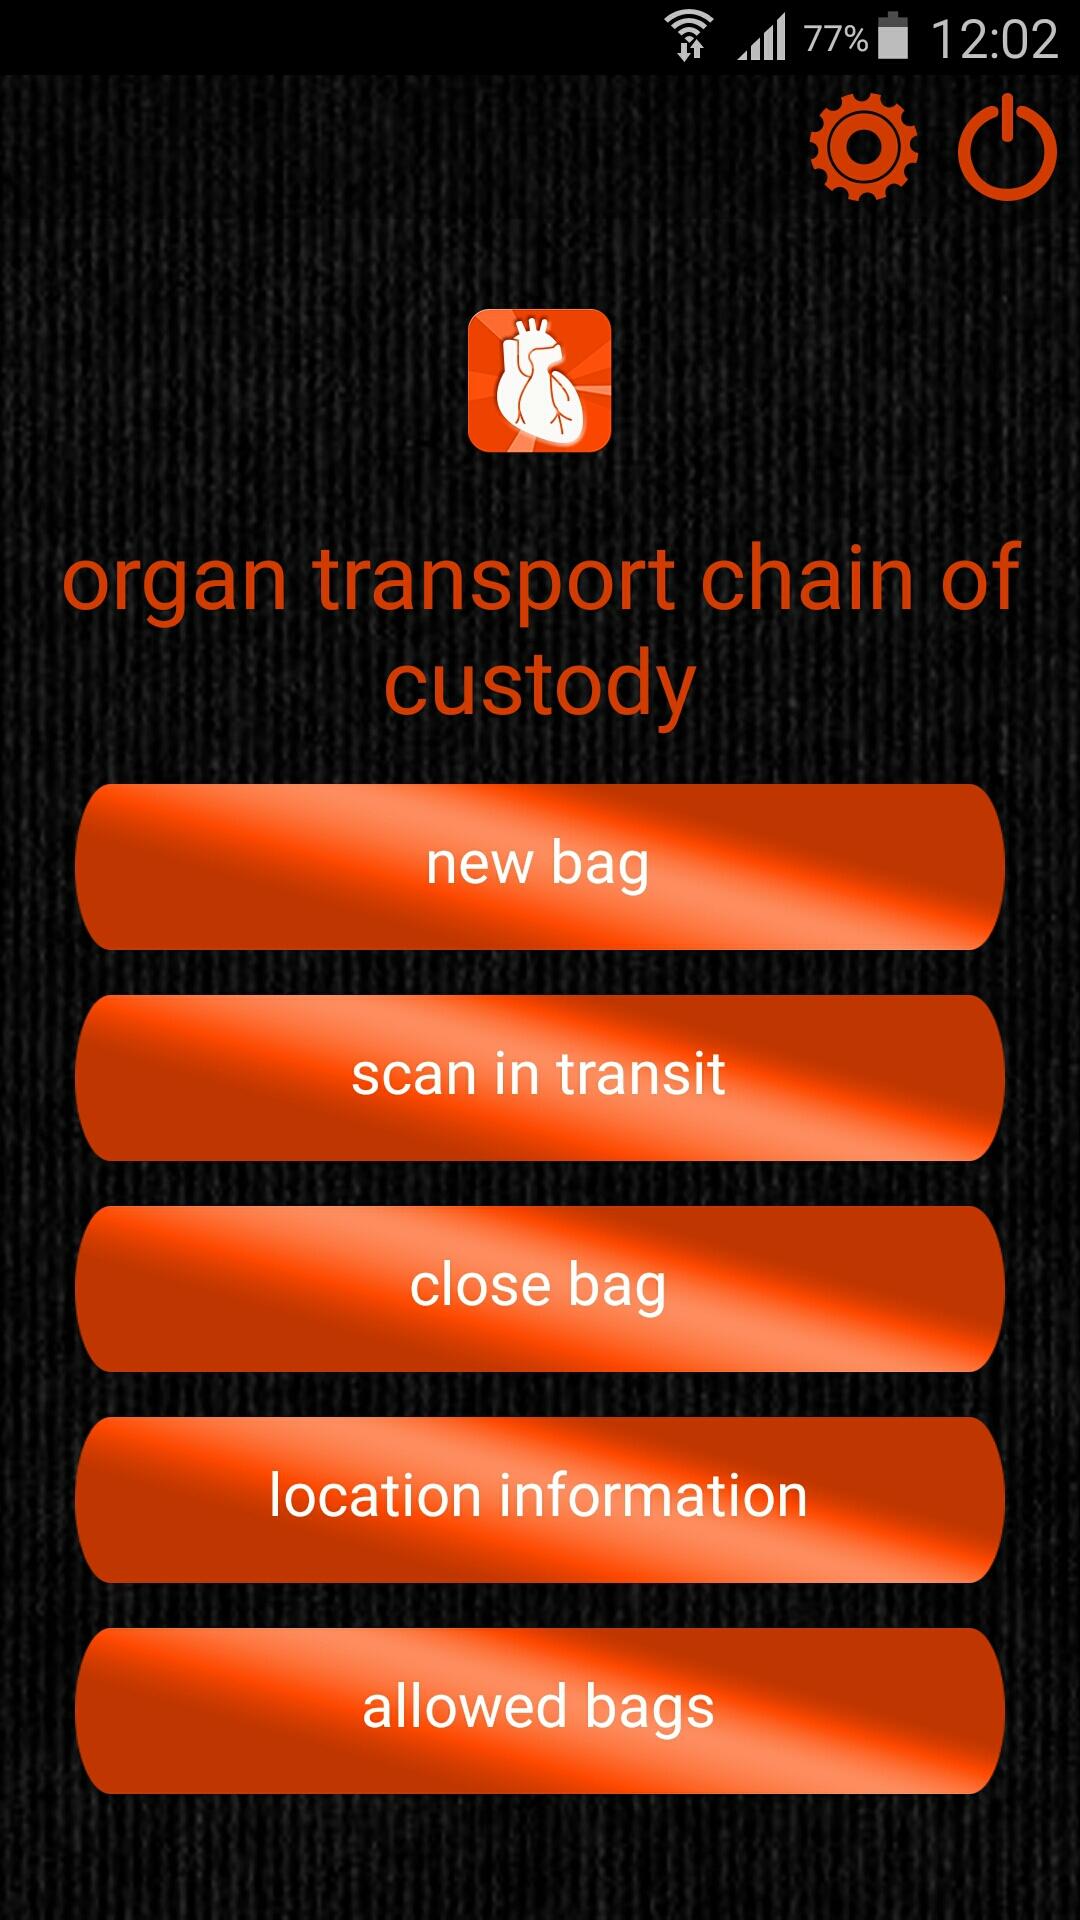 ginstr_app_organTransportChainOfCustody_EN-2